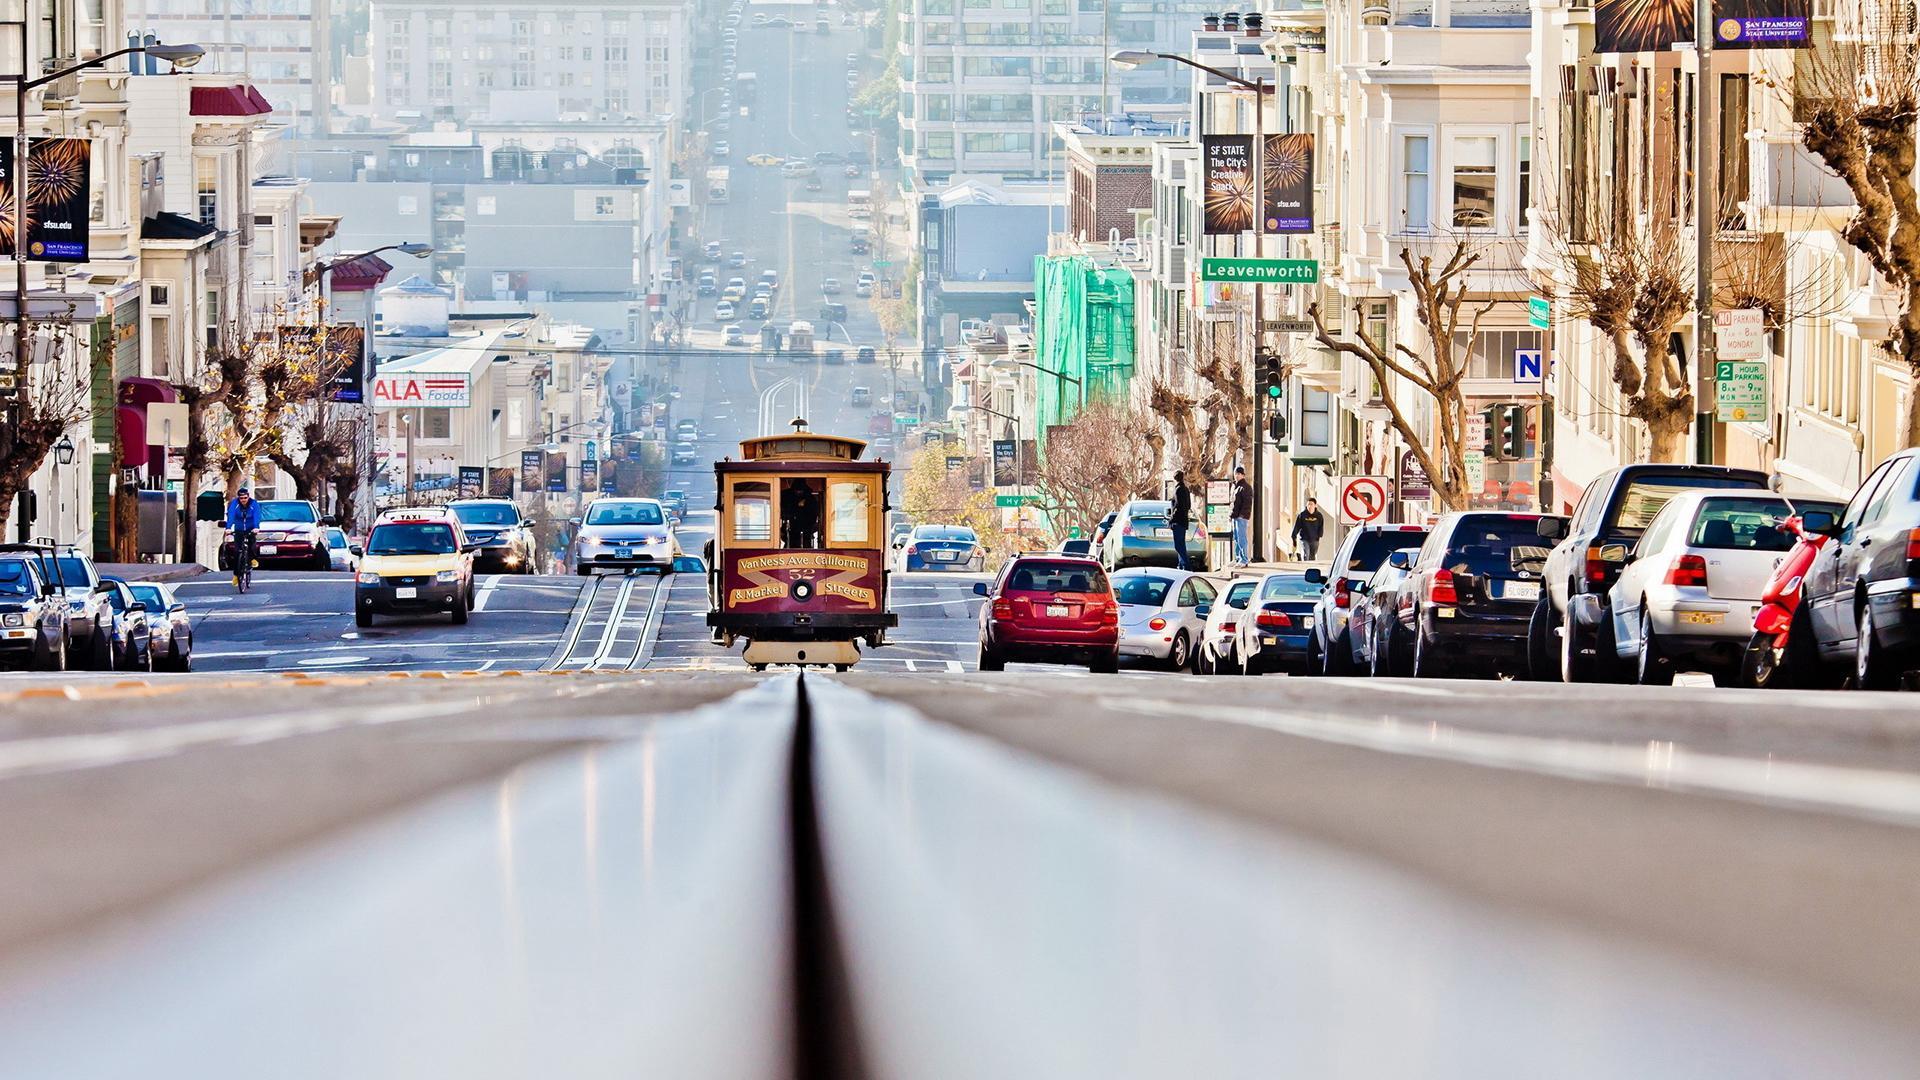 San Francisco Tram HD Wallpaper FullHDWpp   Full HD Wallpapers 1920x1080